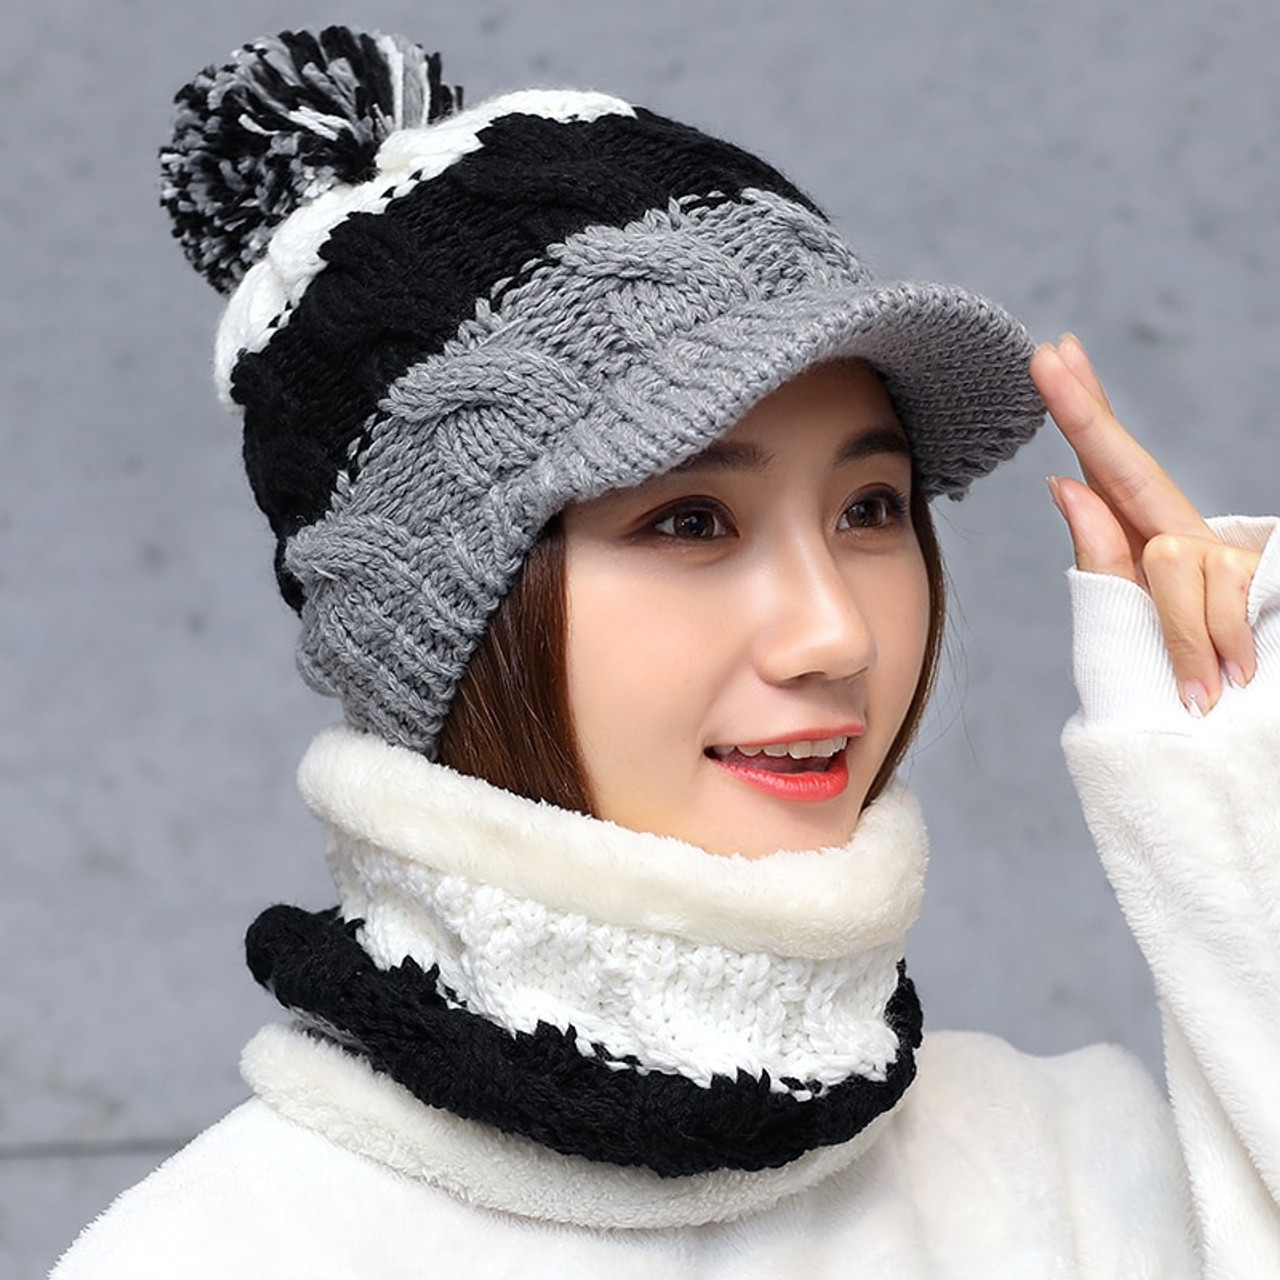 07cf2e05f3 Balaclava Women's Knitted Hat Scarf Caps Neck Warmer Winter Hats For Men  Women Skullies Beanies Warm ...